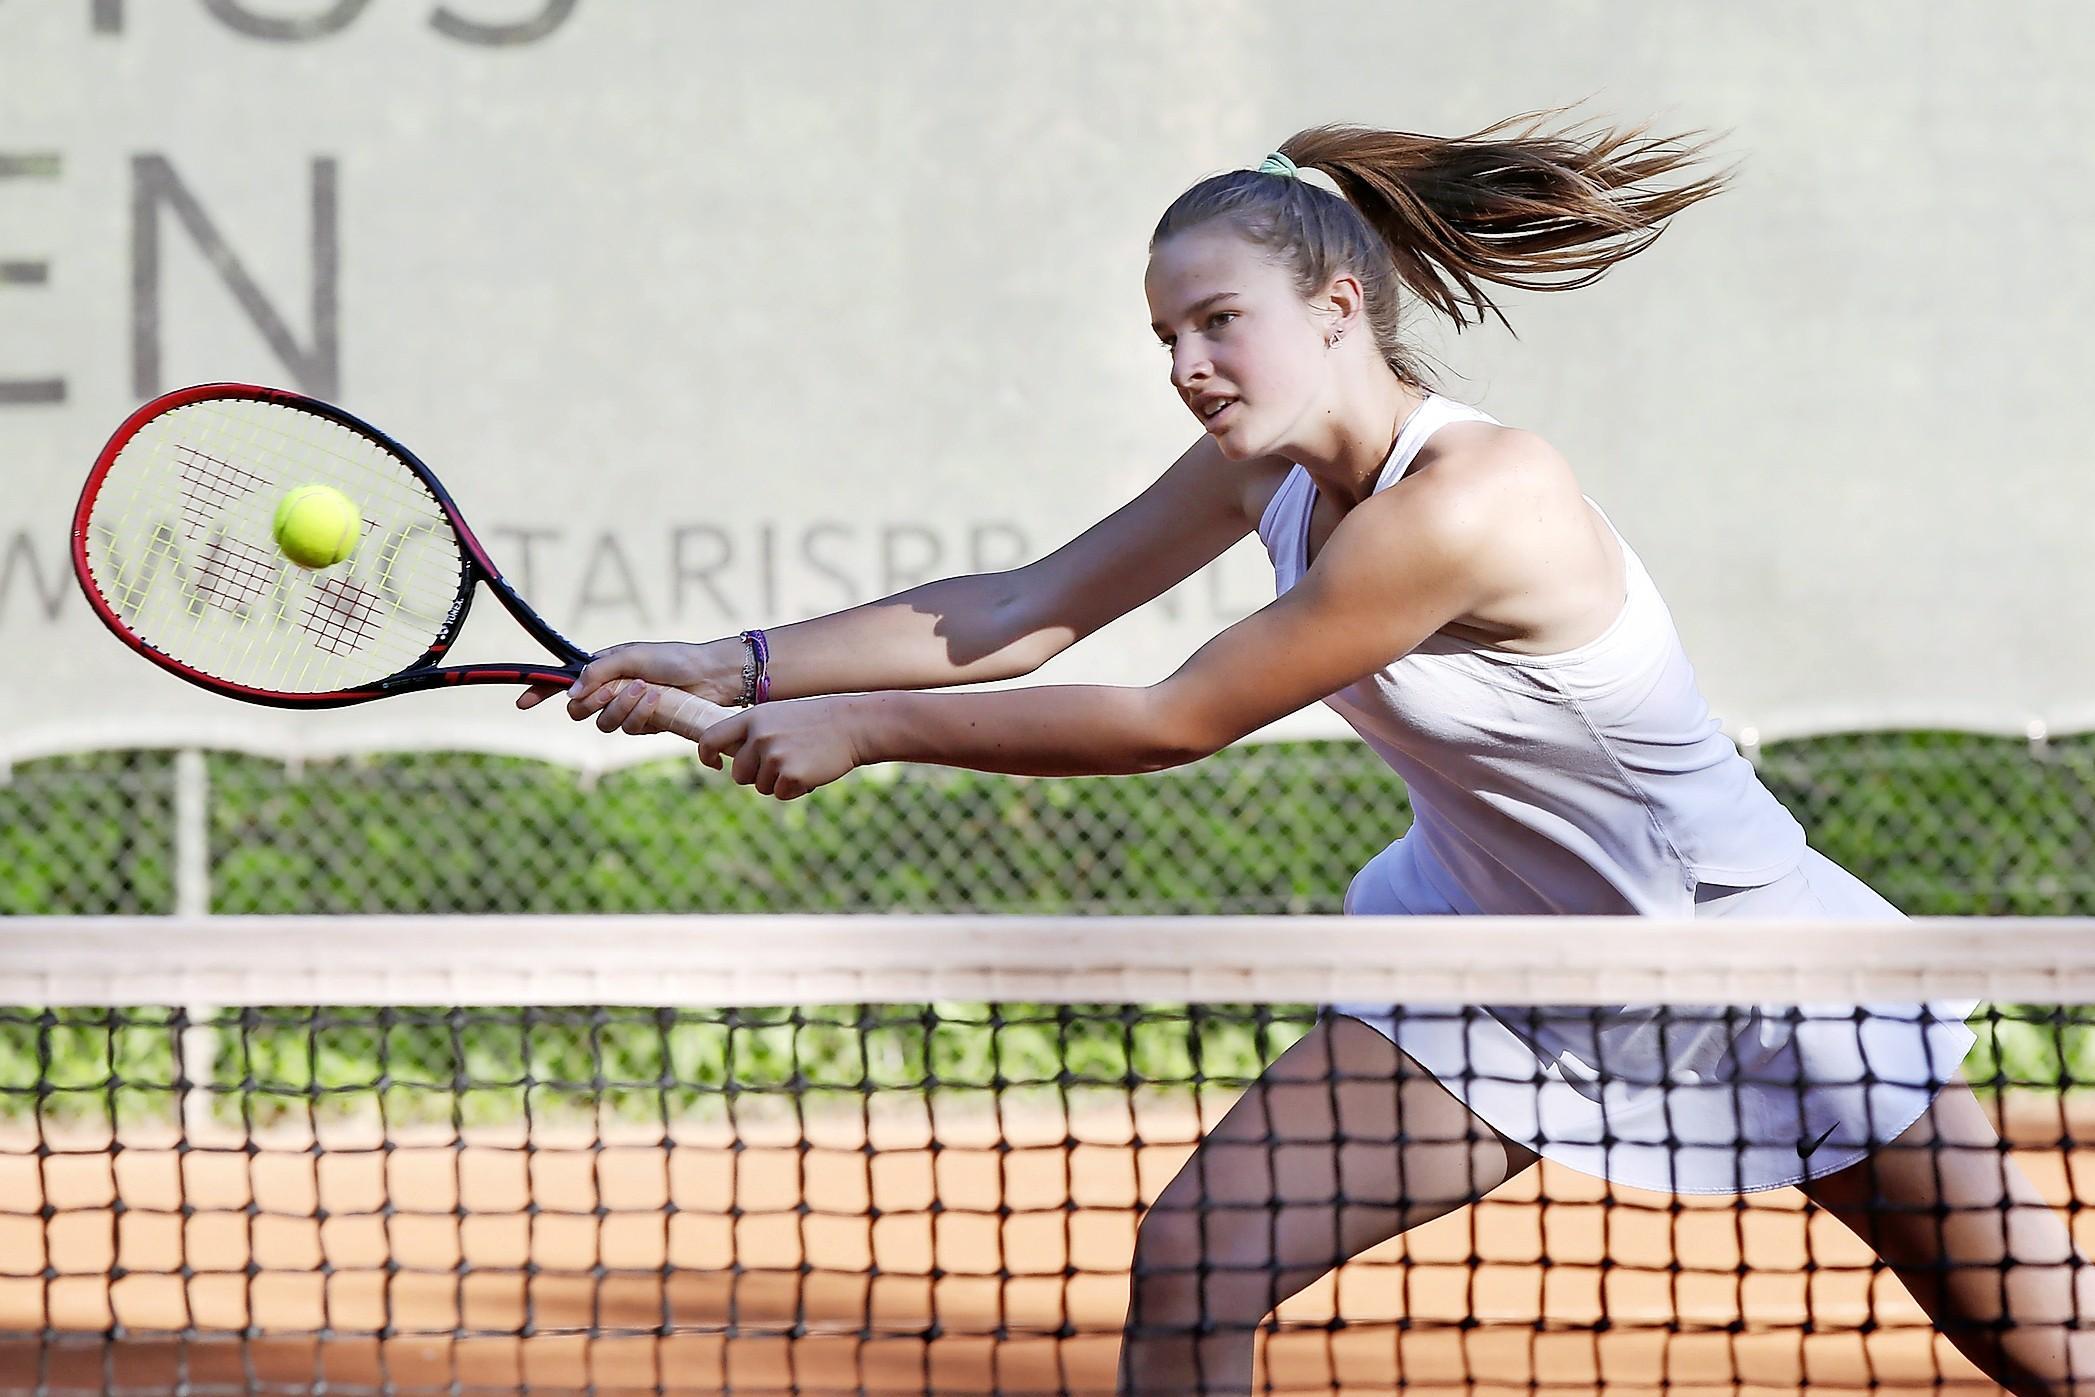 Tennistalent Isabelle Haverlag: 'Ik word niet gepusht'